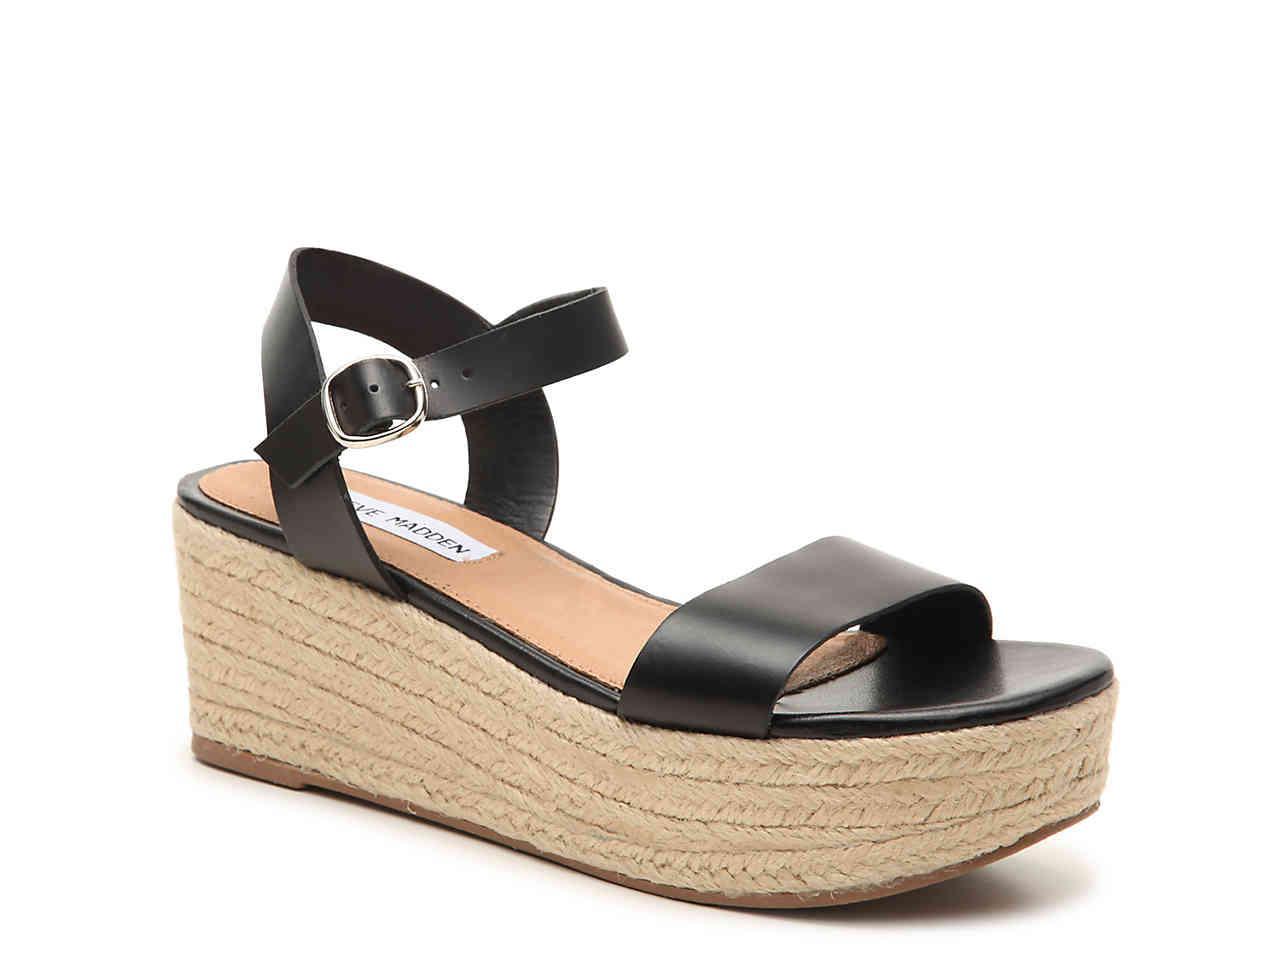 4d325daad3d Women's Black Brandice Espadrille Wedge Sandal